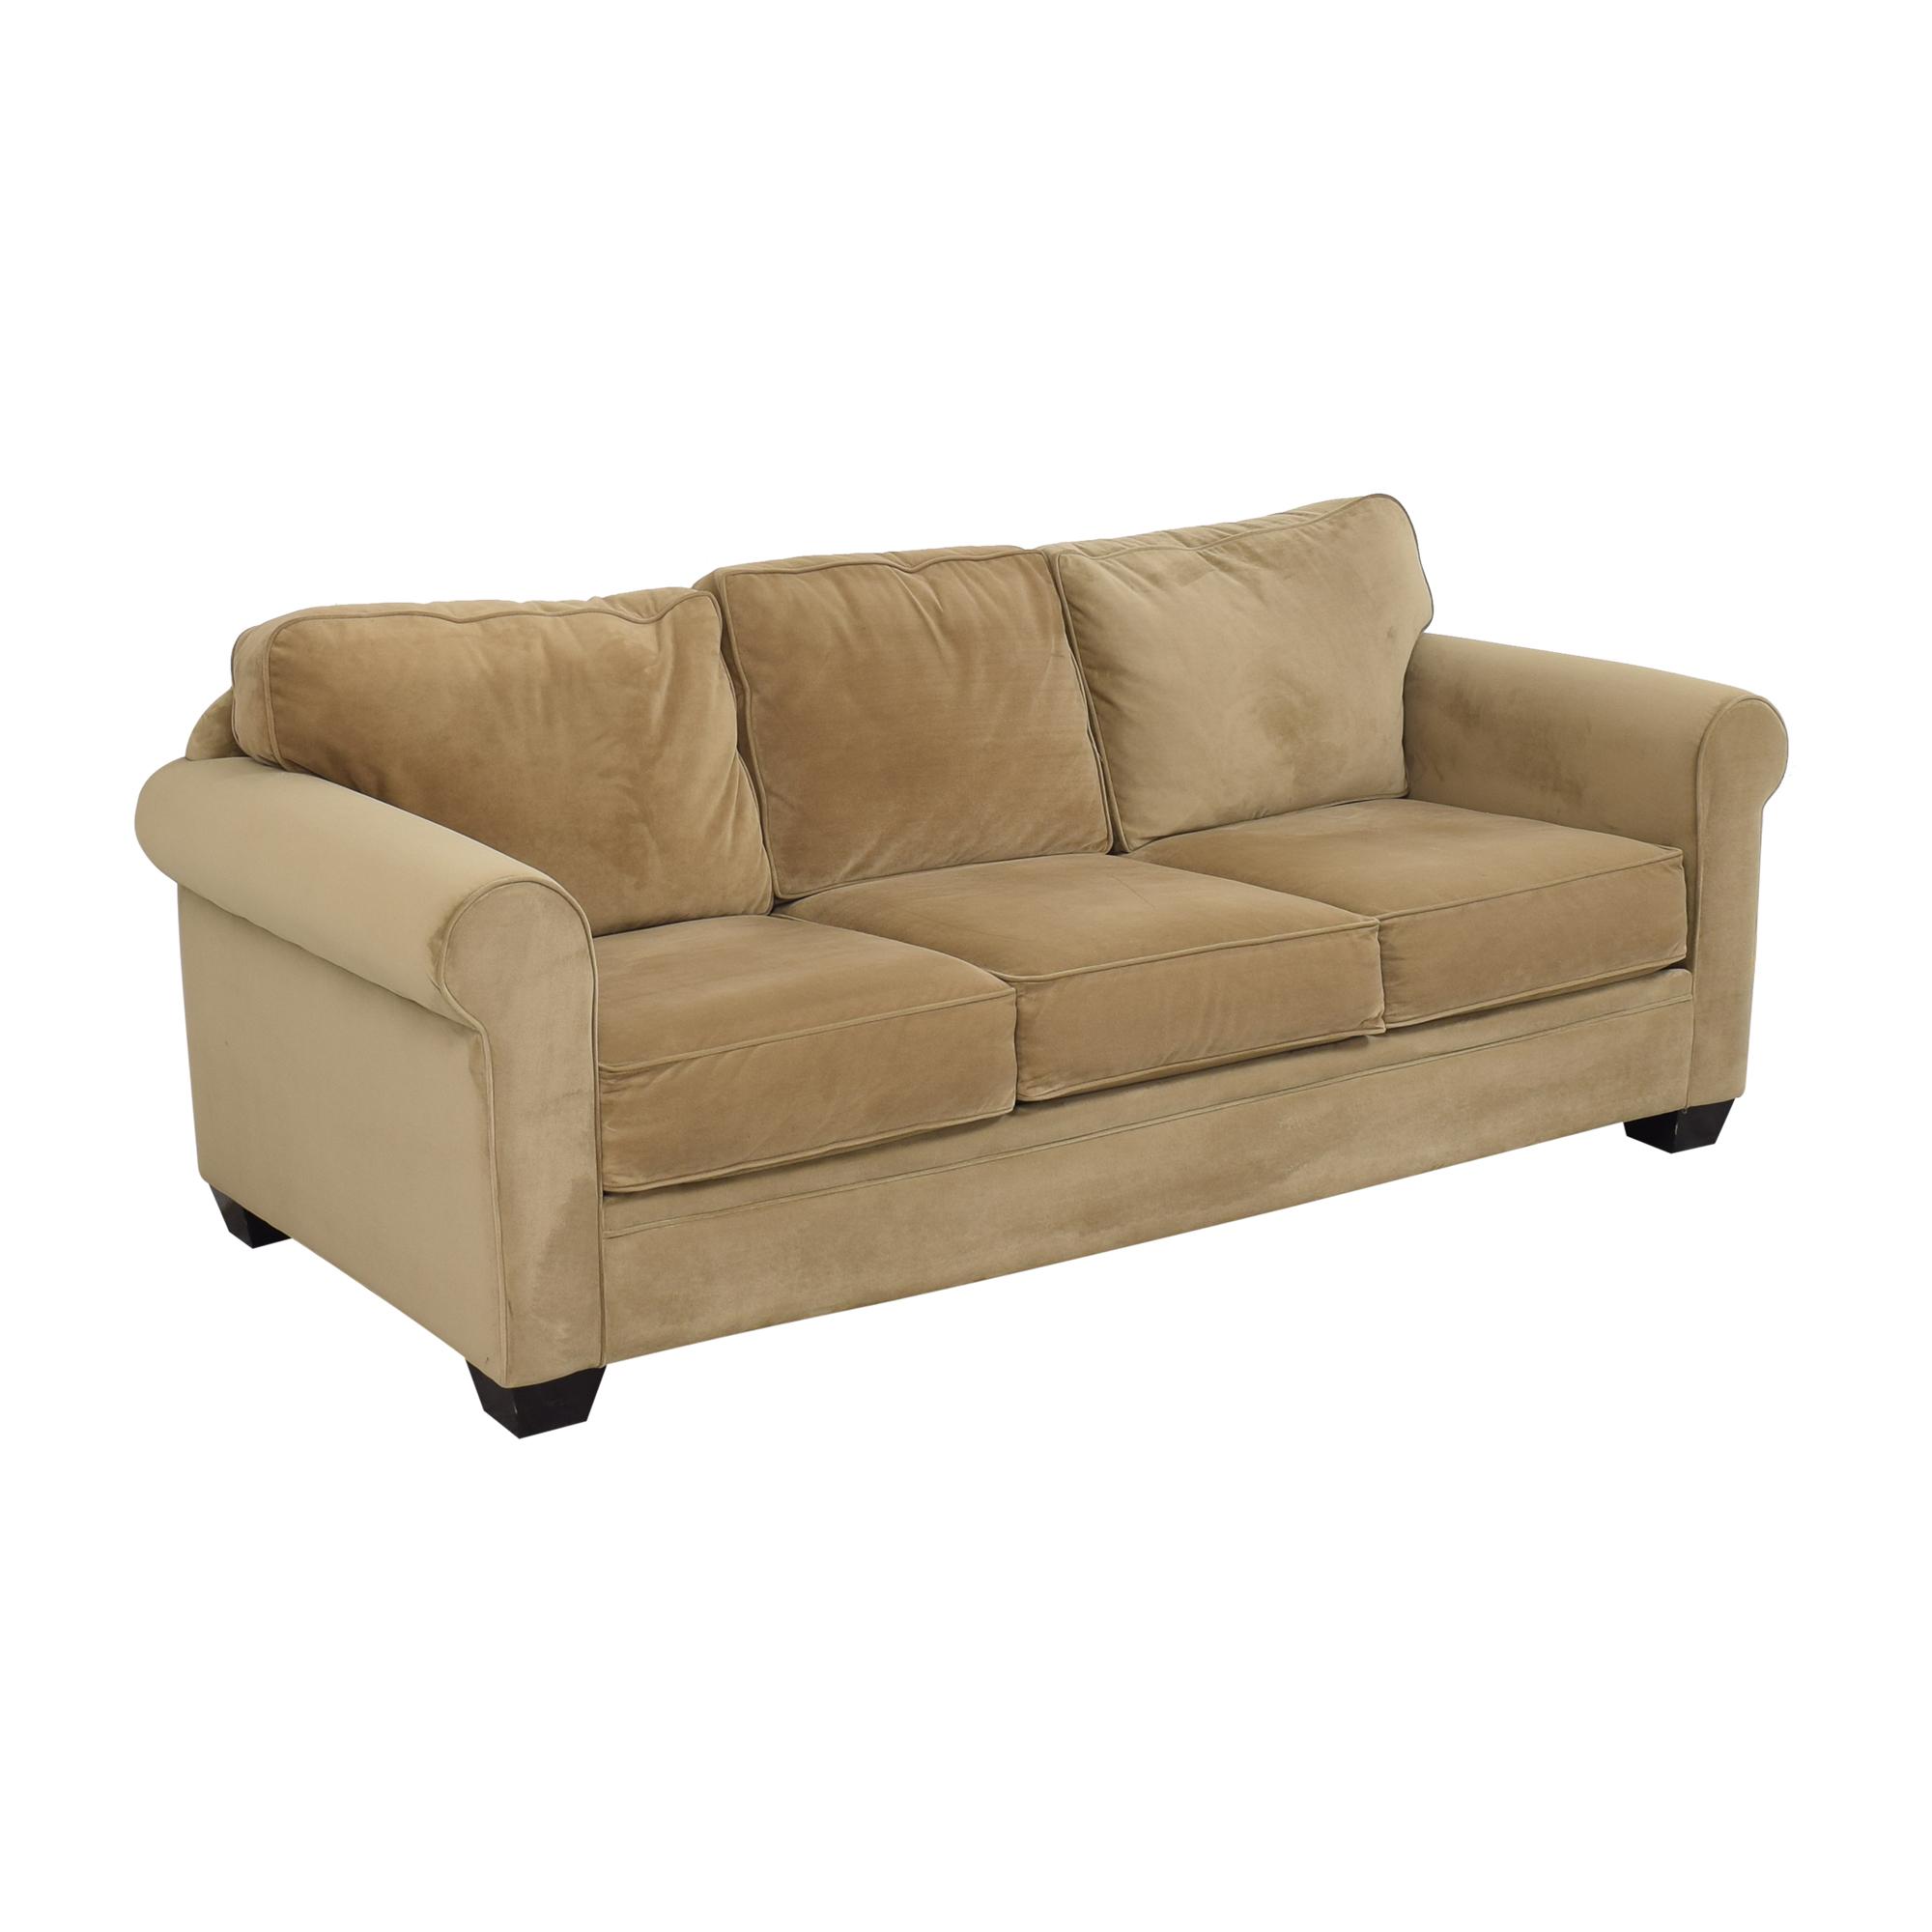 Macy's Macy's Roll Arm Sofa